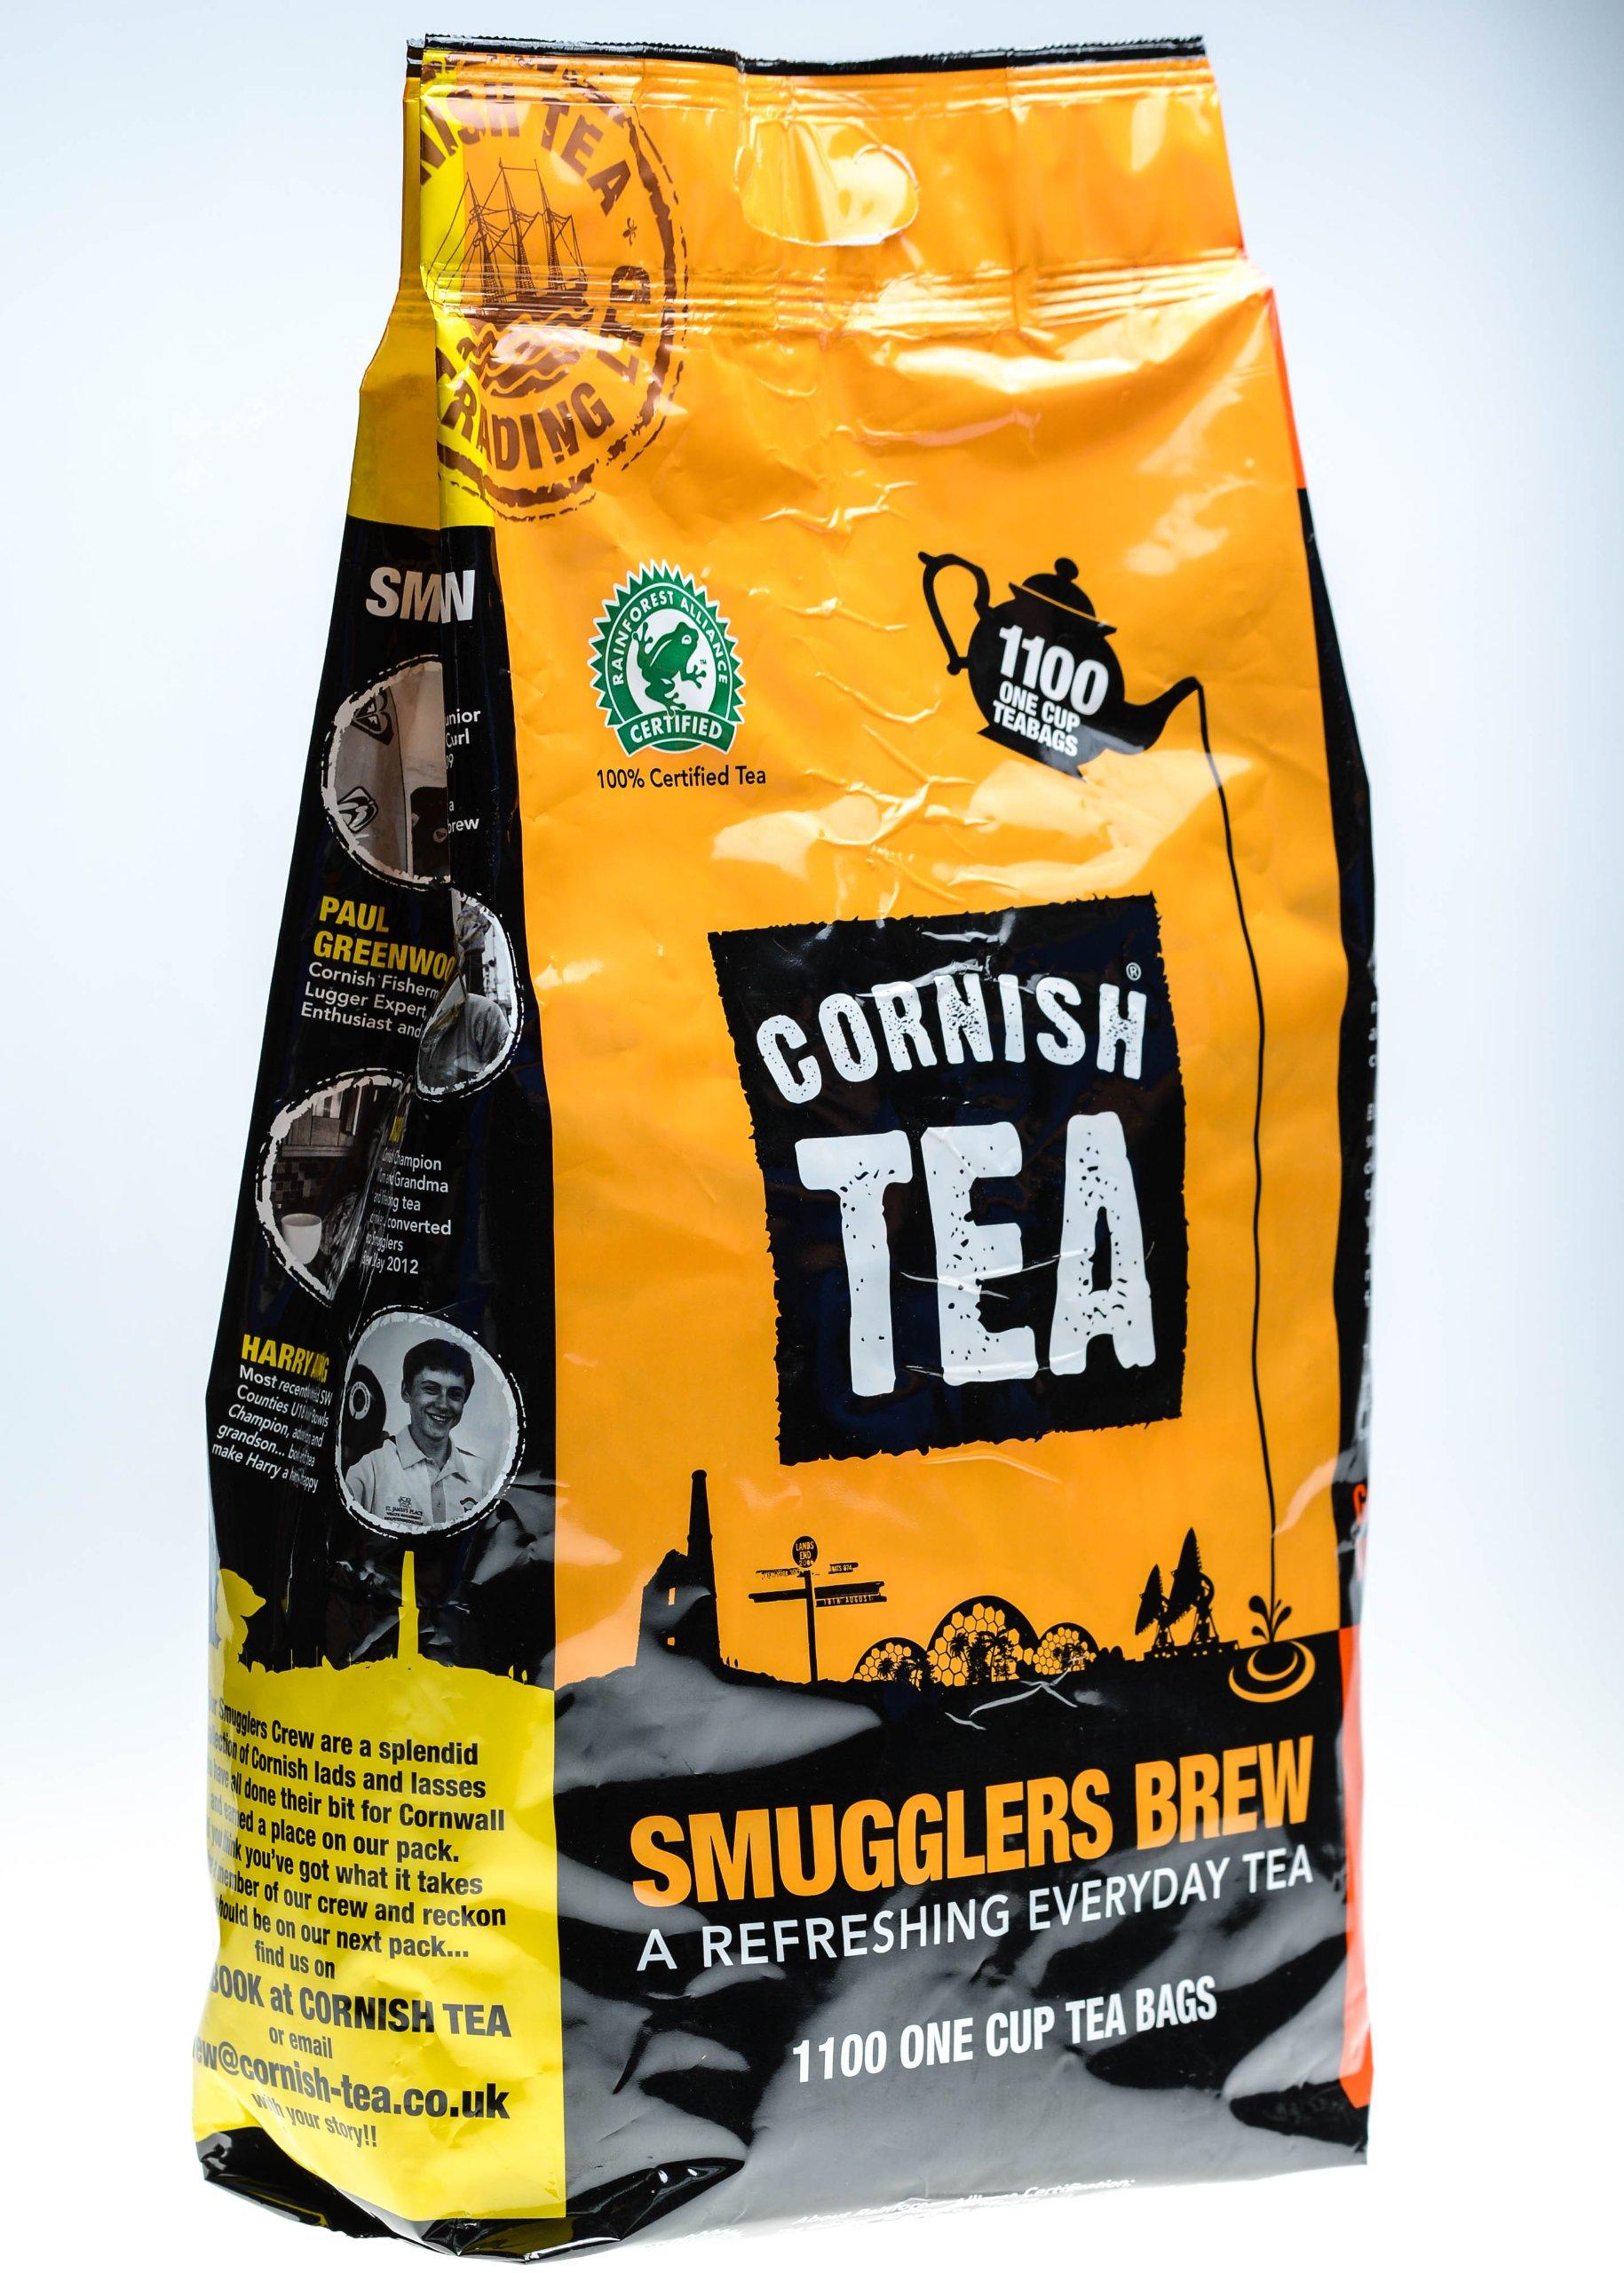 Cornish Tea - Smugglers Brew Tea Bags (1100)